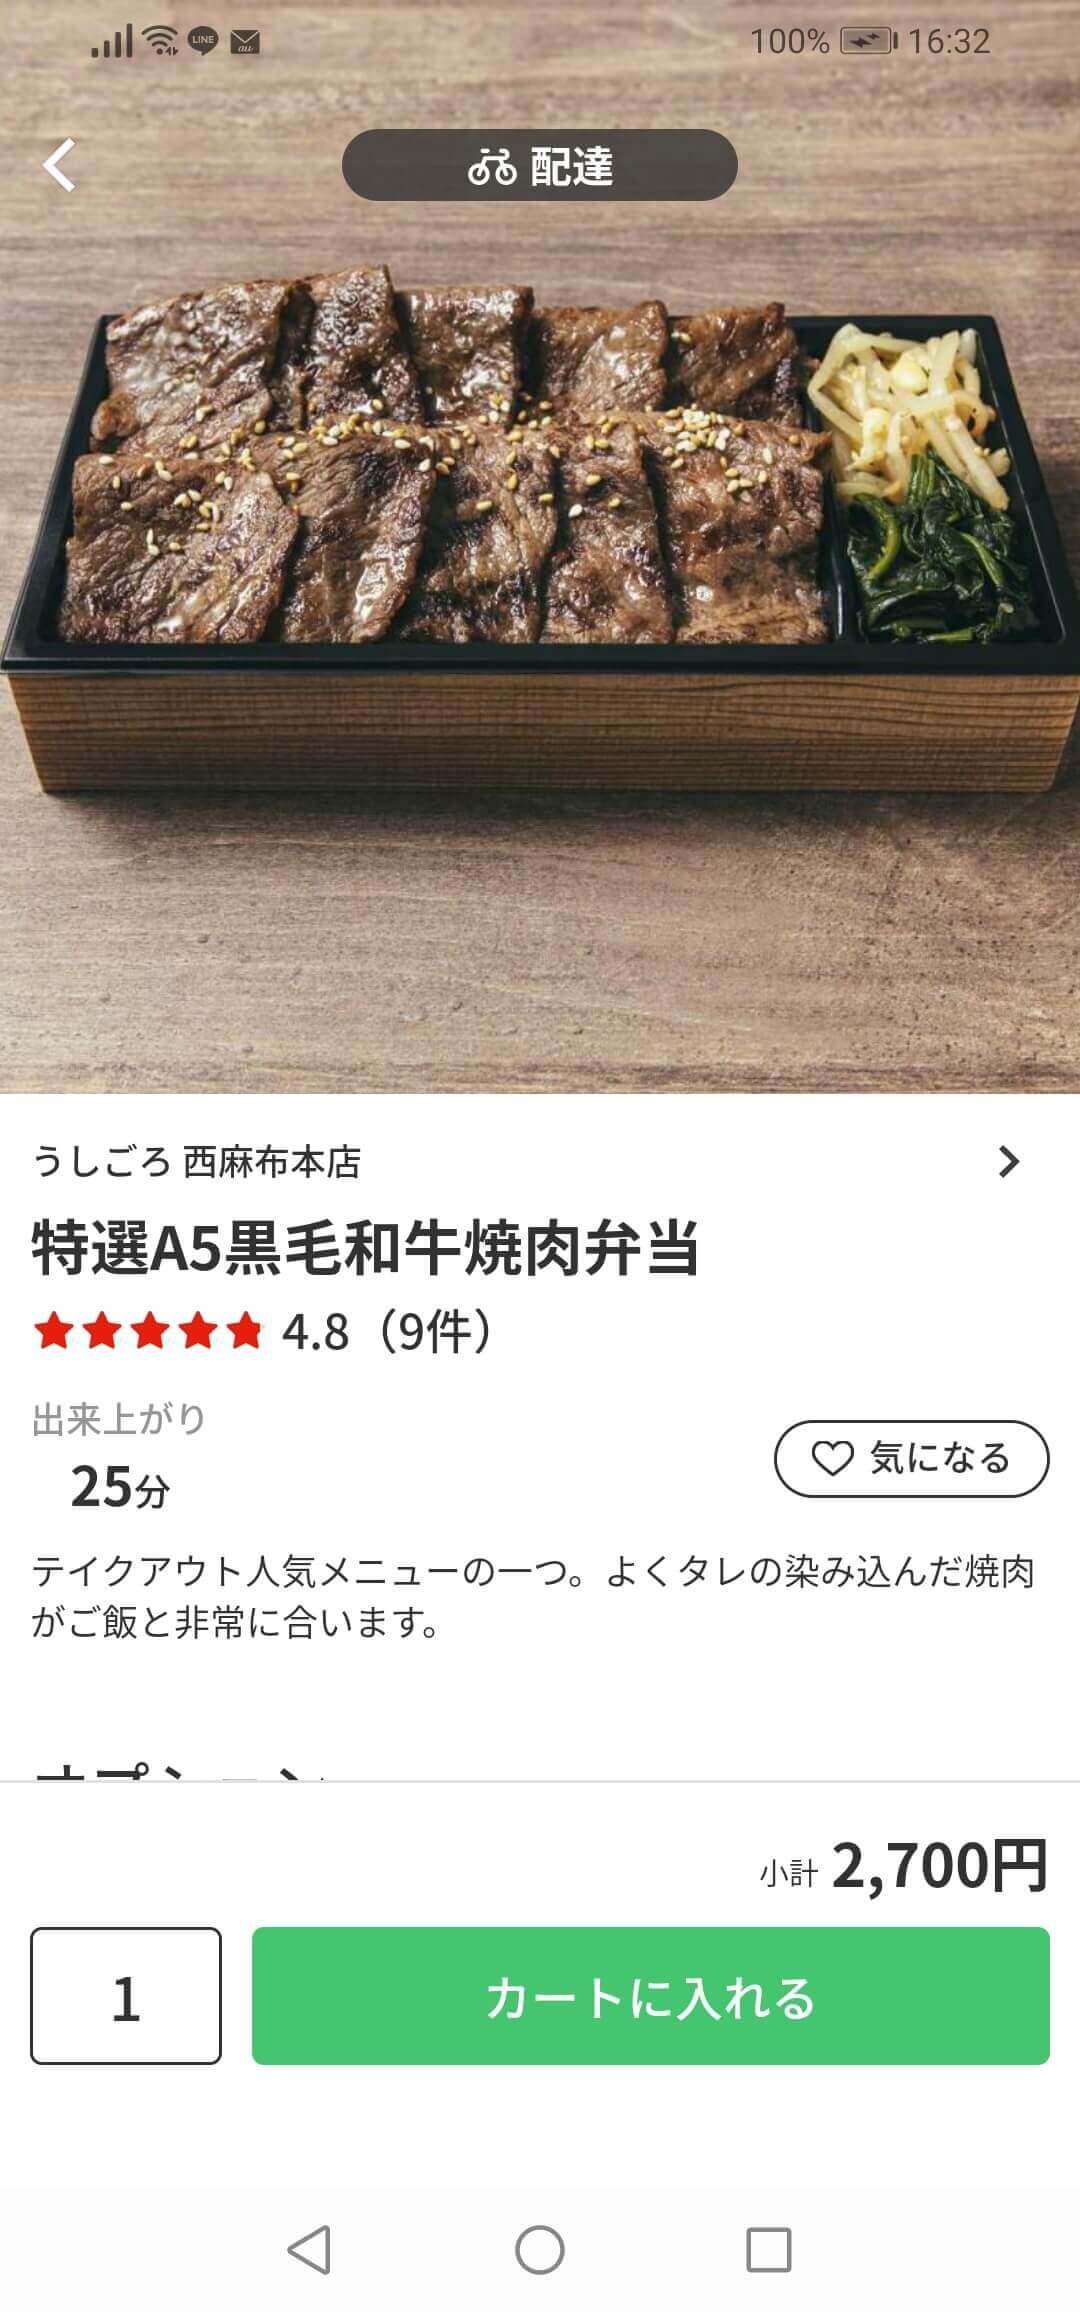 menu(メニュー)東京都内のおすすめ店舗・韓国料理/焼肉【うしごろ 西麻布本店】『特選A5黒毛和牛焼肉弁当』2,700円